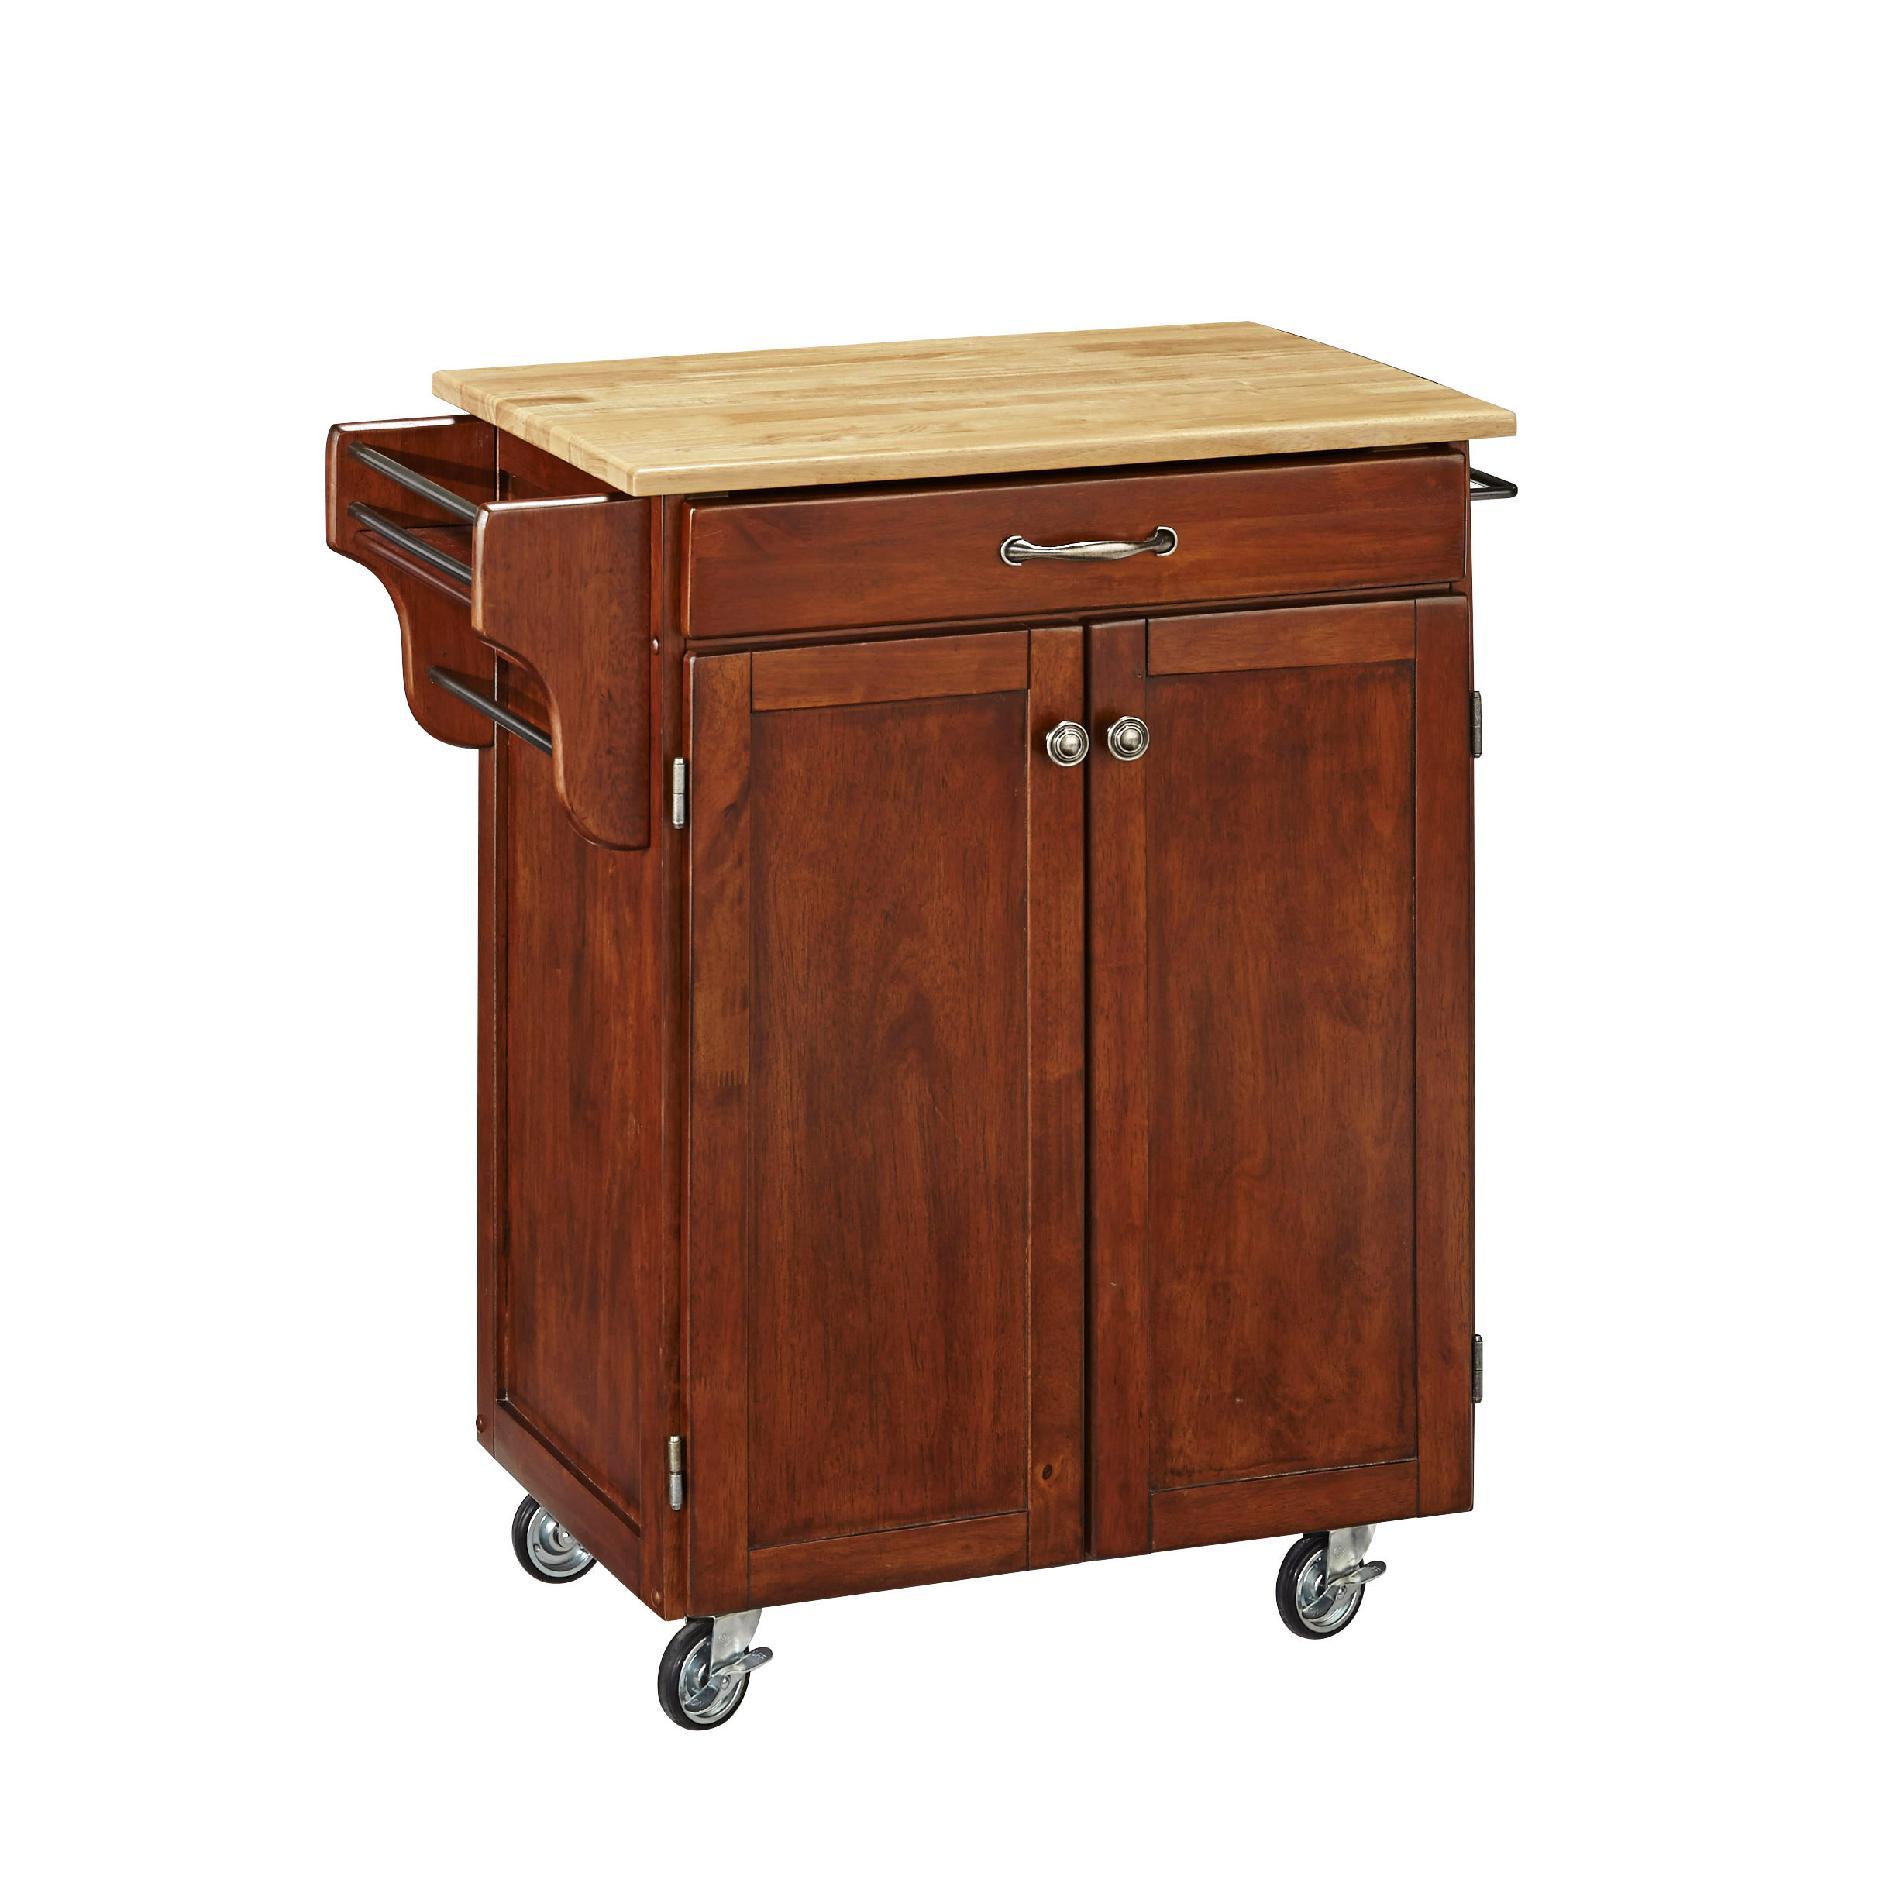 Home Styles Create-A-Cart 35.5